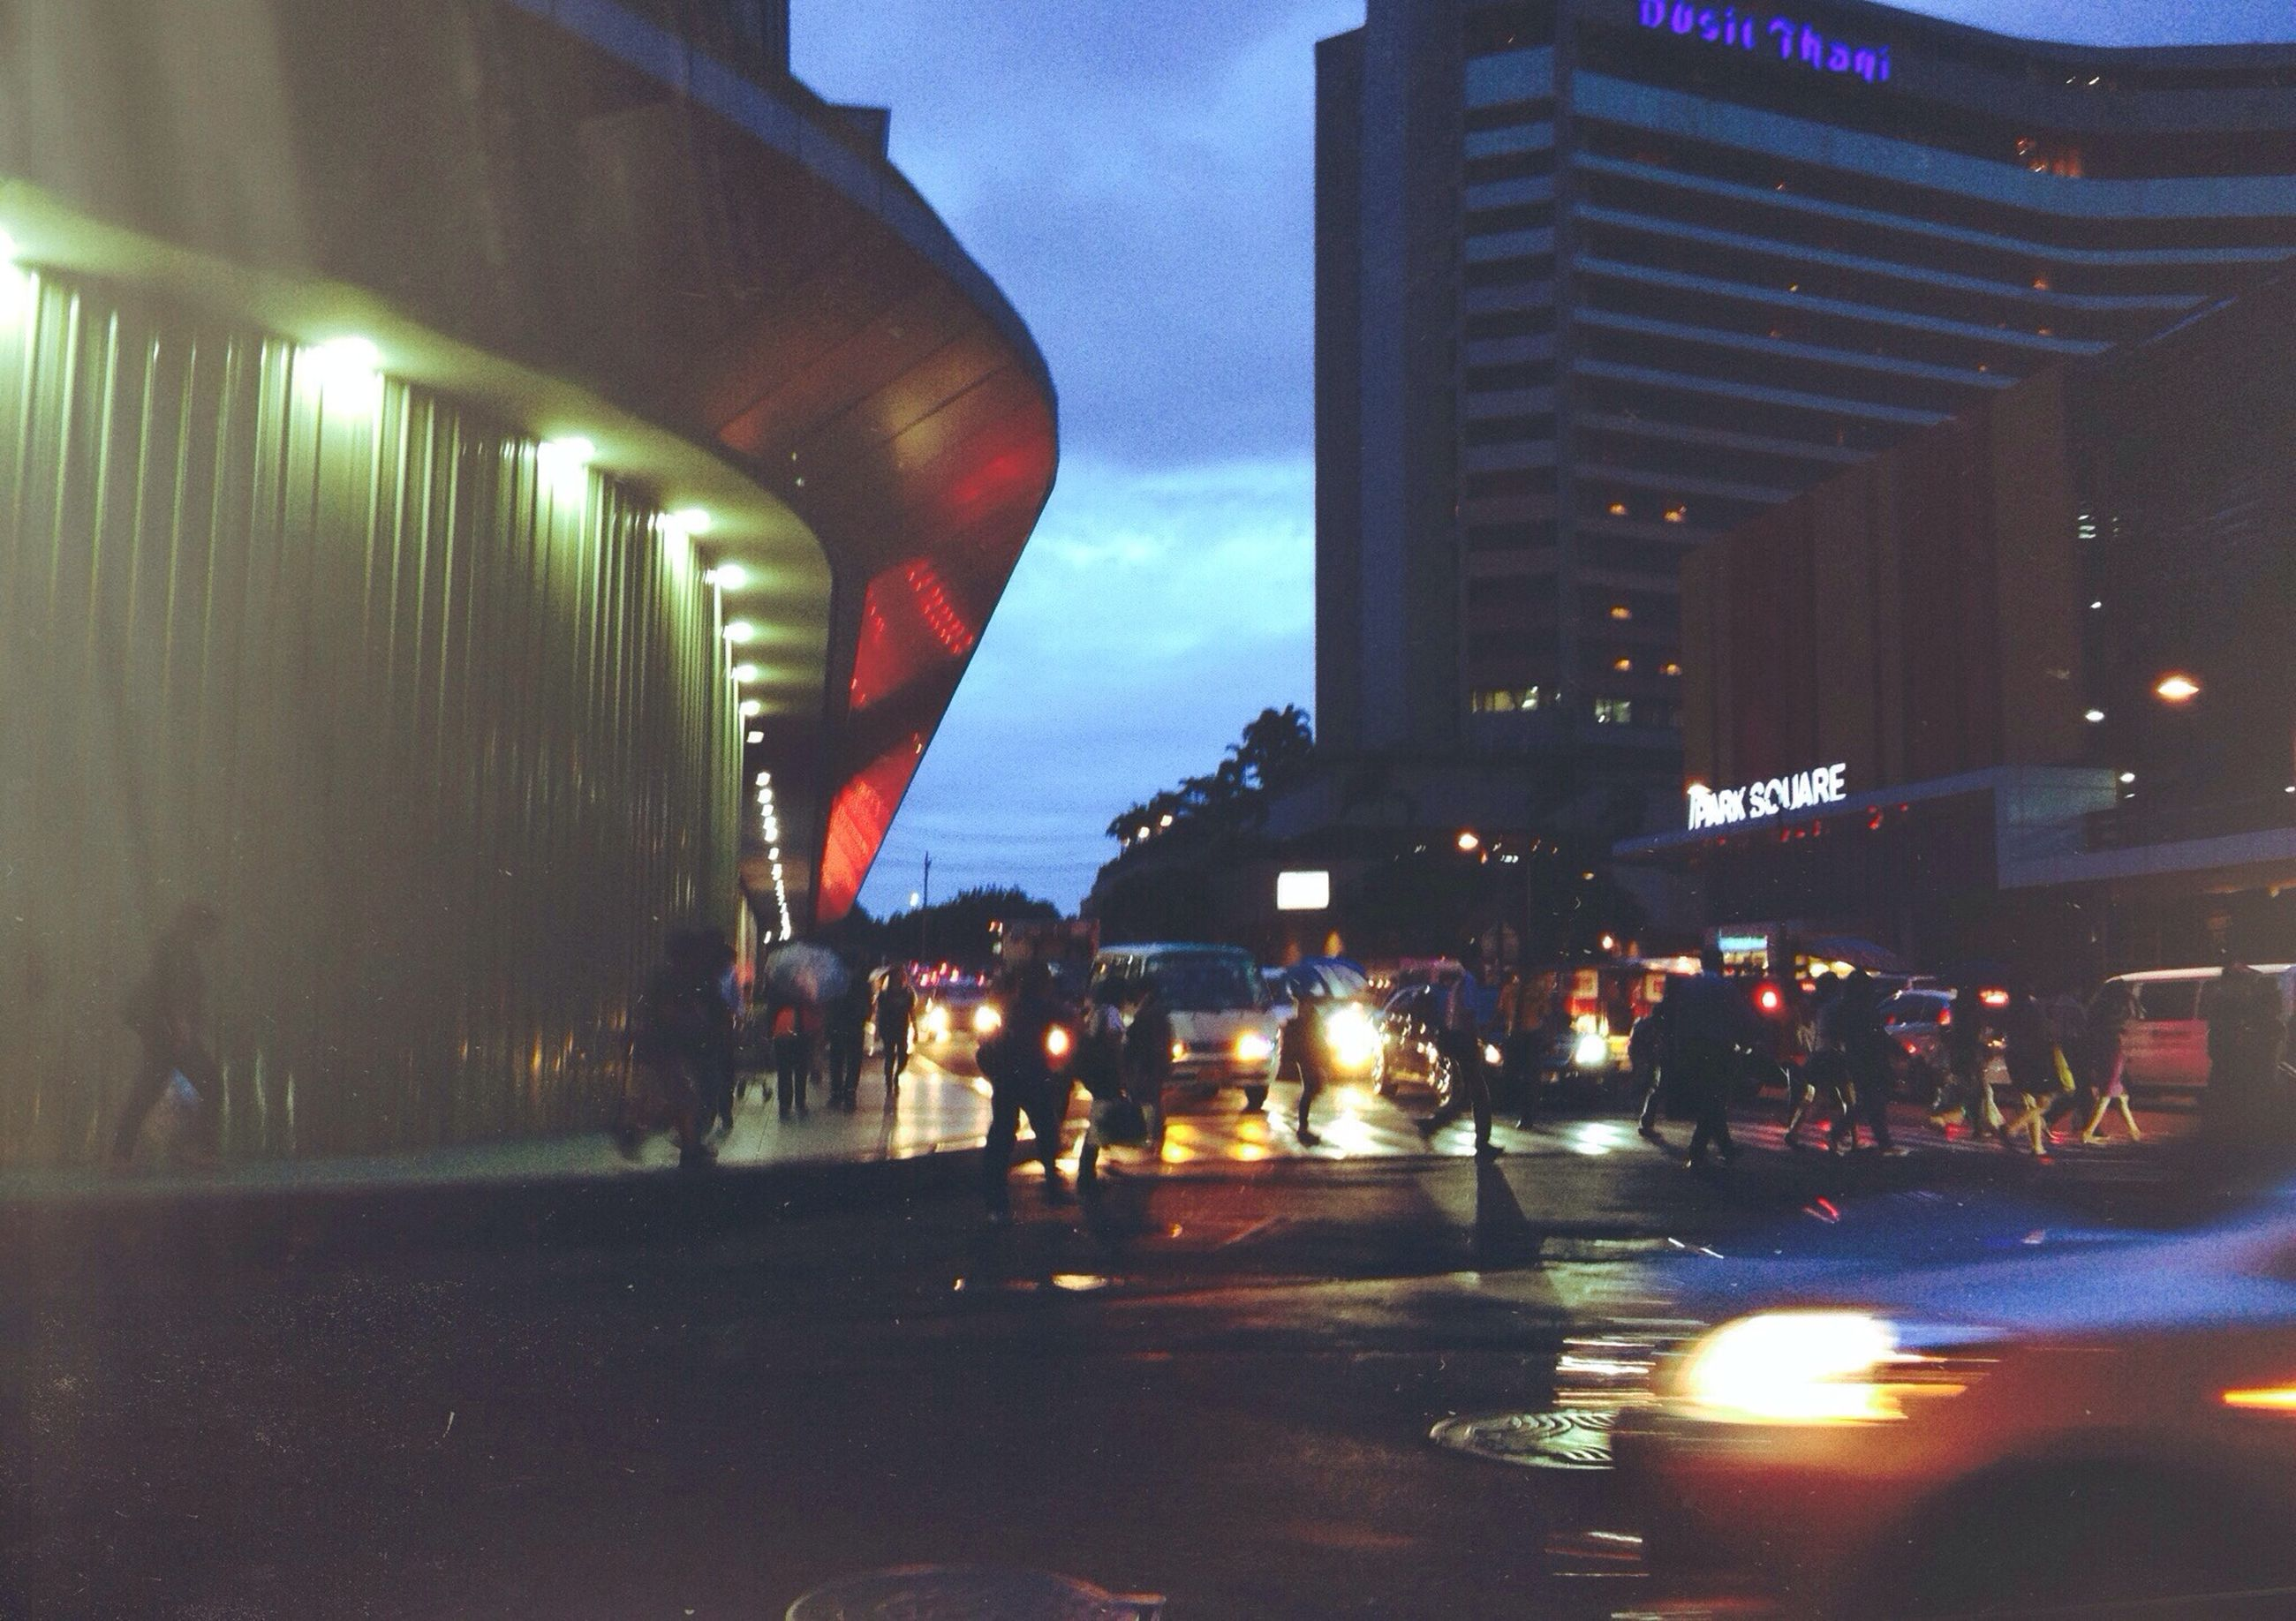 illuminated, night, architecture, building exterior, built structure, city, street, transportation, street light, city life, car, city street, road, land vehicle, sky, lighting equipment, mode of transport, incidental people, travel, dusk